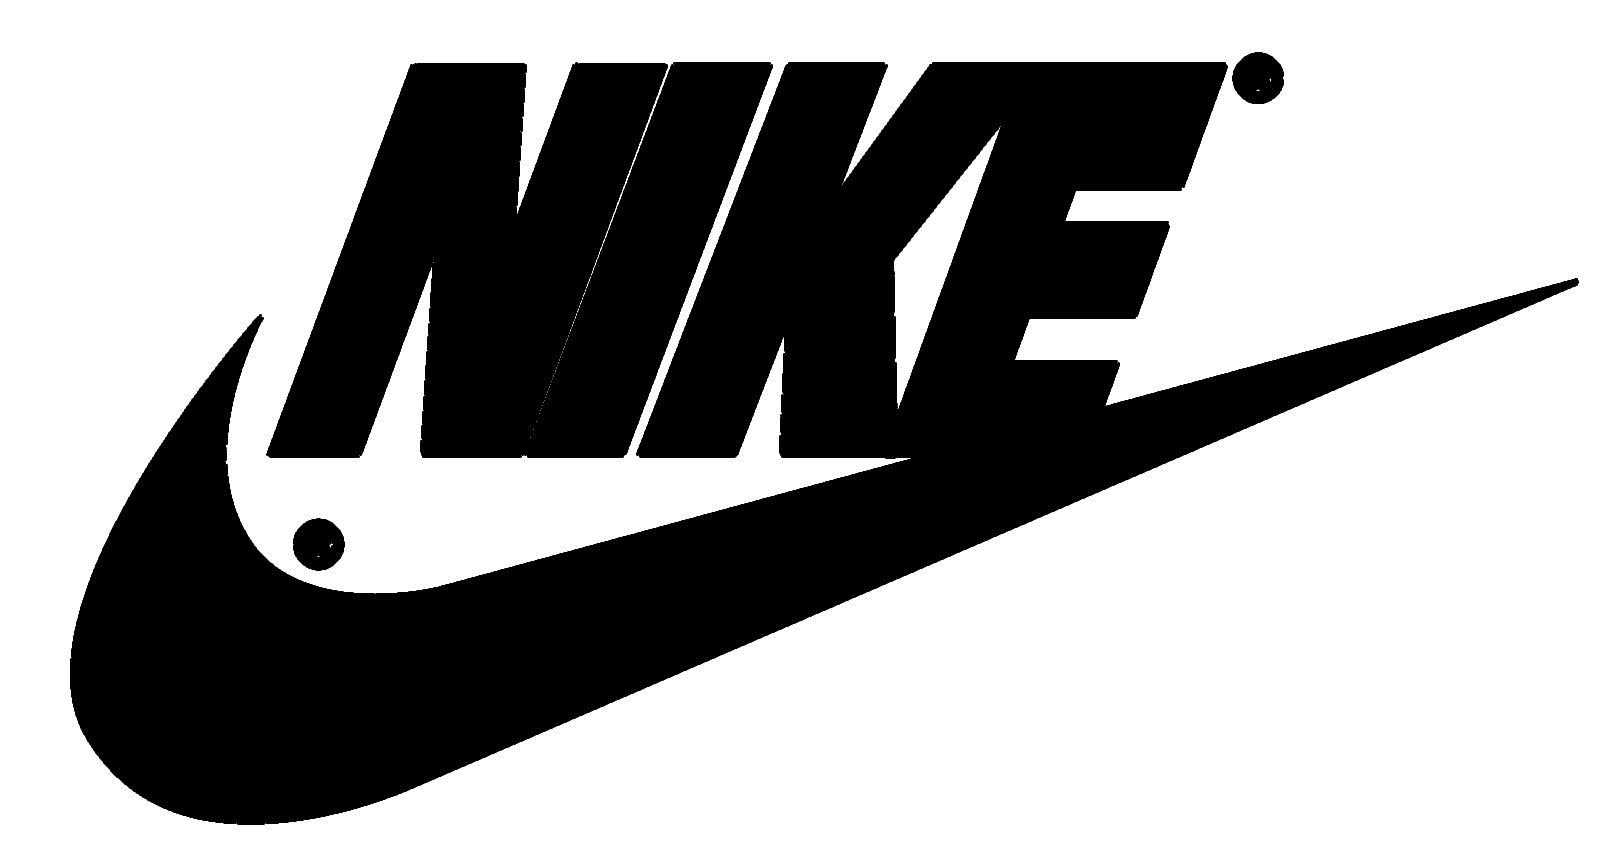 Nike emblem all logos world pinterest nike logo sports nike logo nike symbol meaning history and evolution biocorpaavc